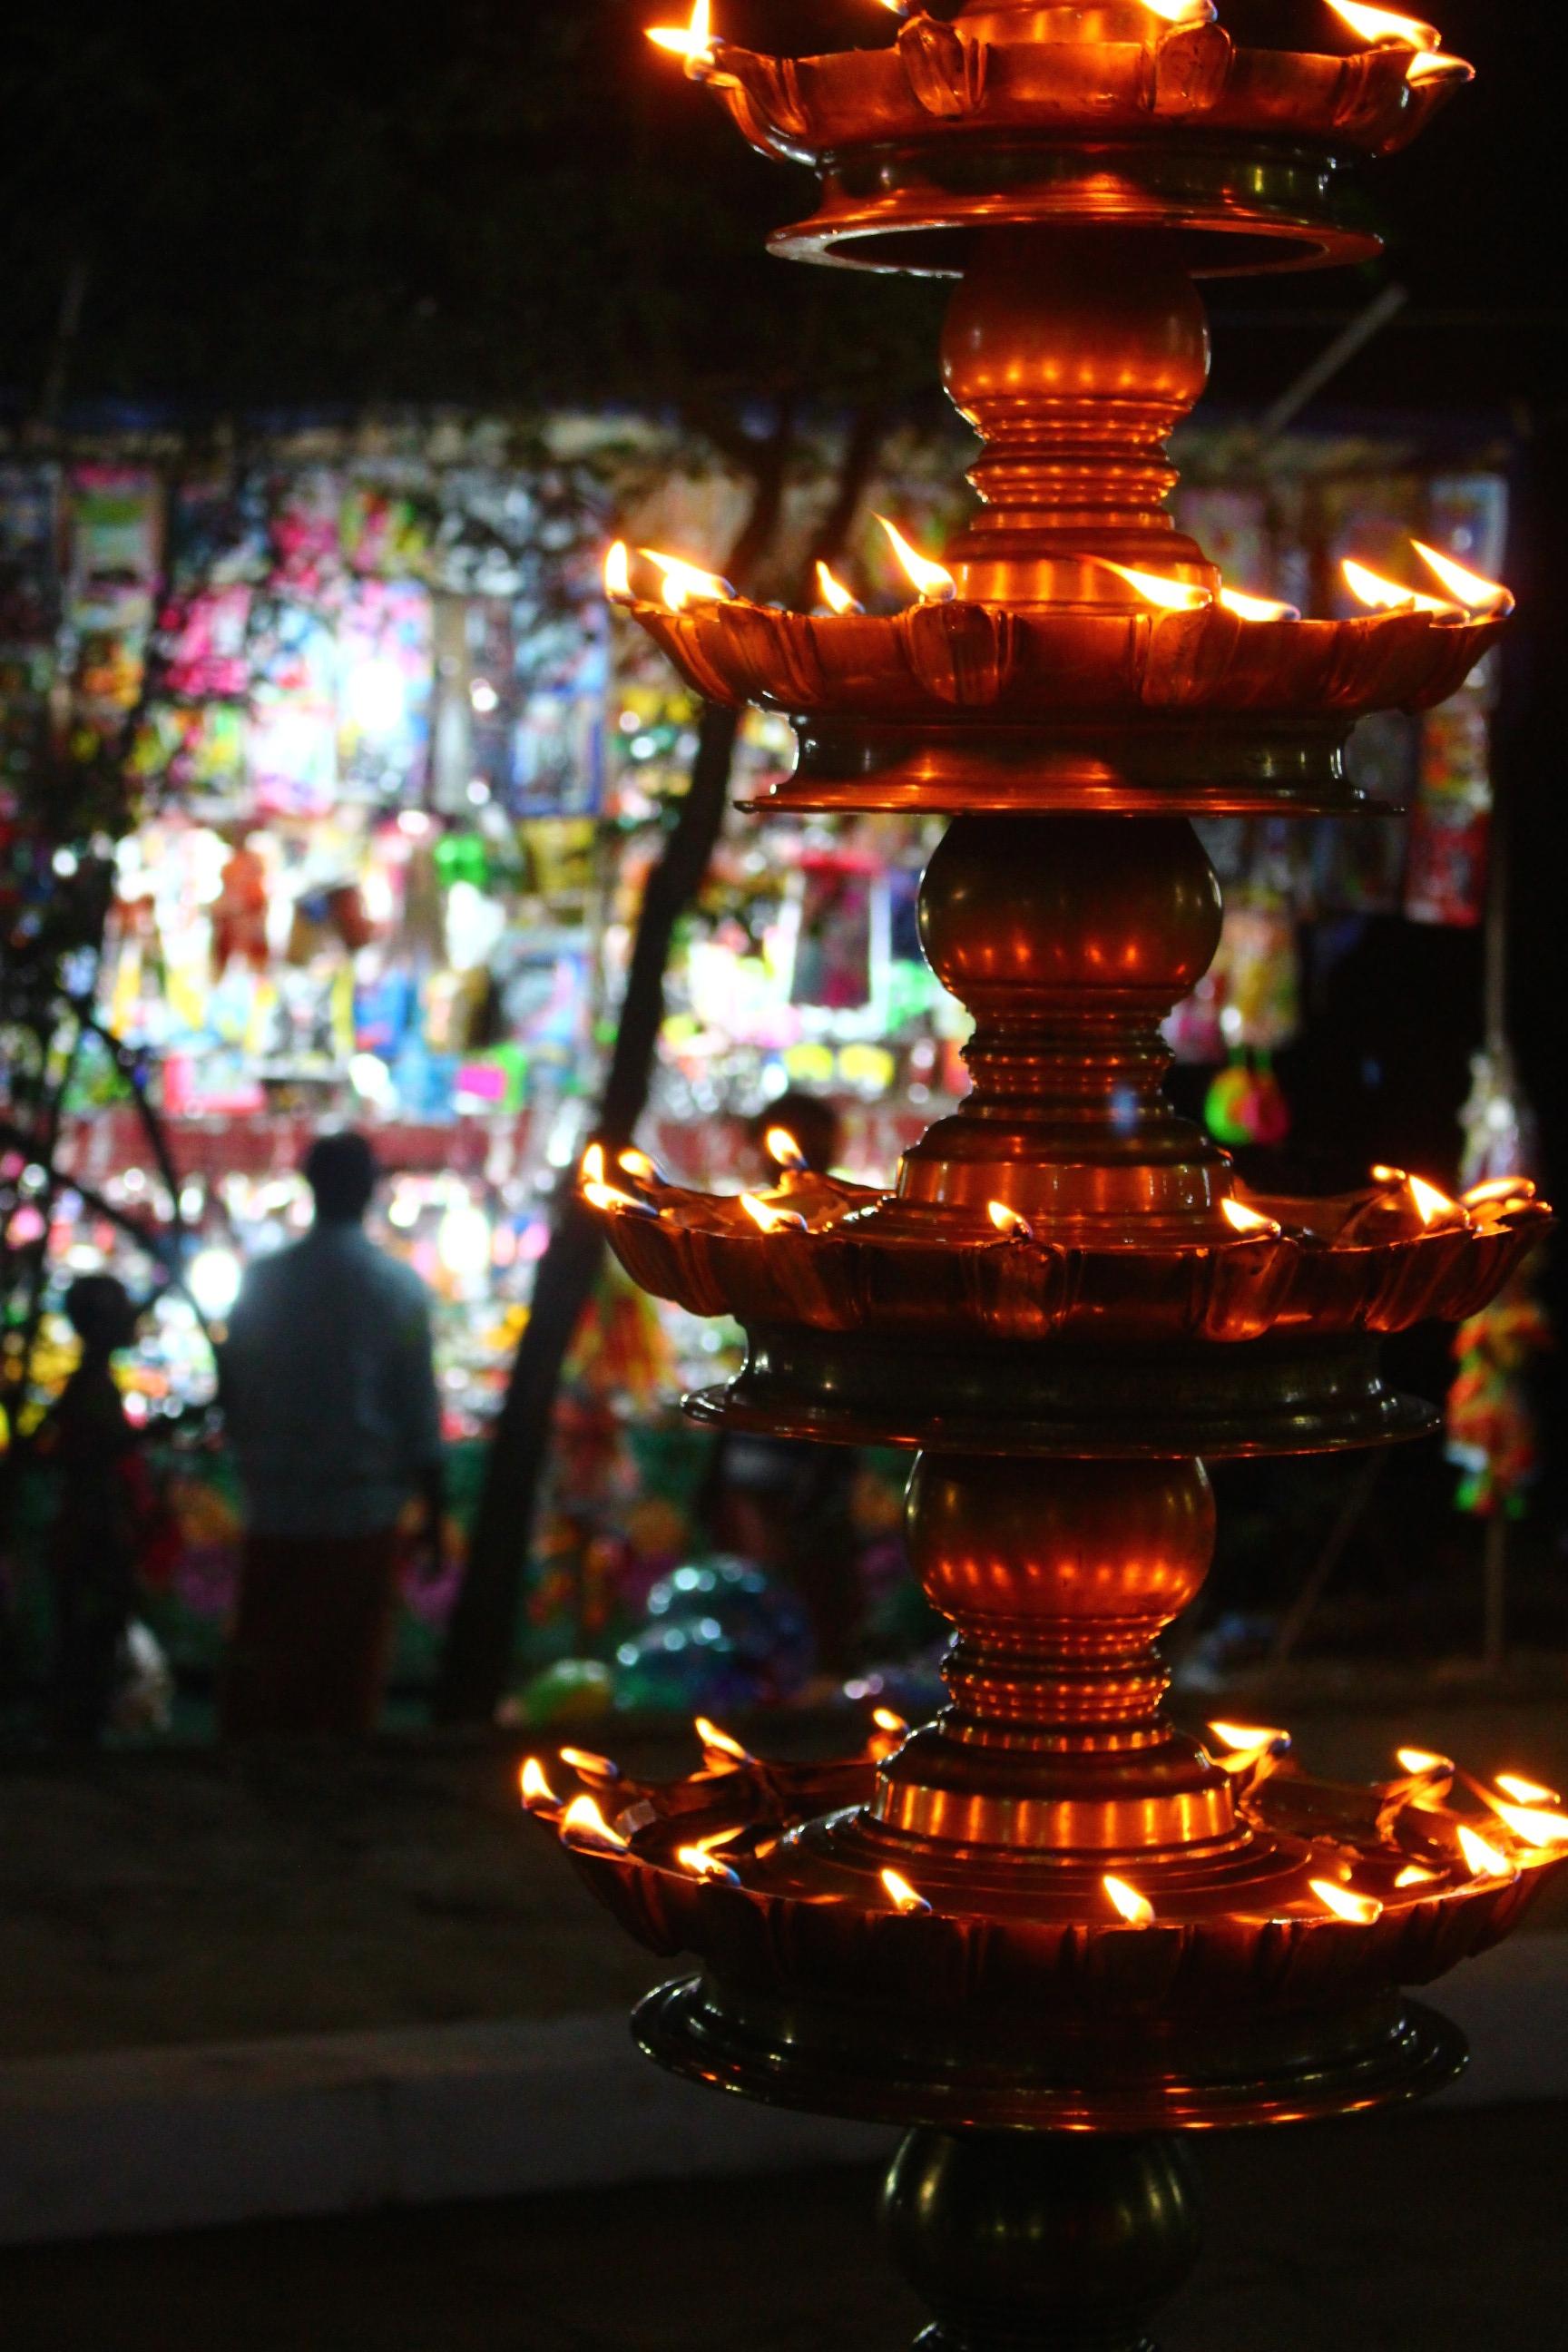 temple-kannur-kerala.jpg